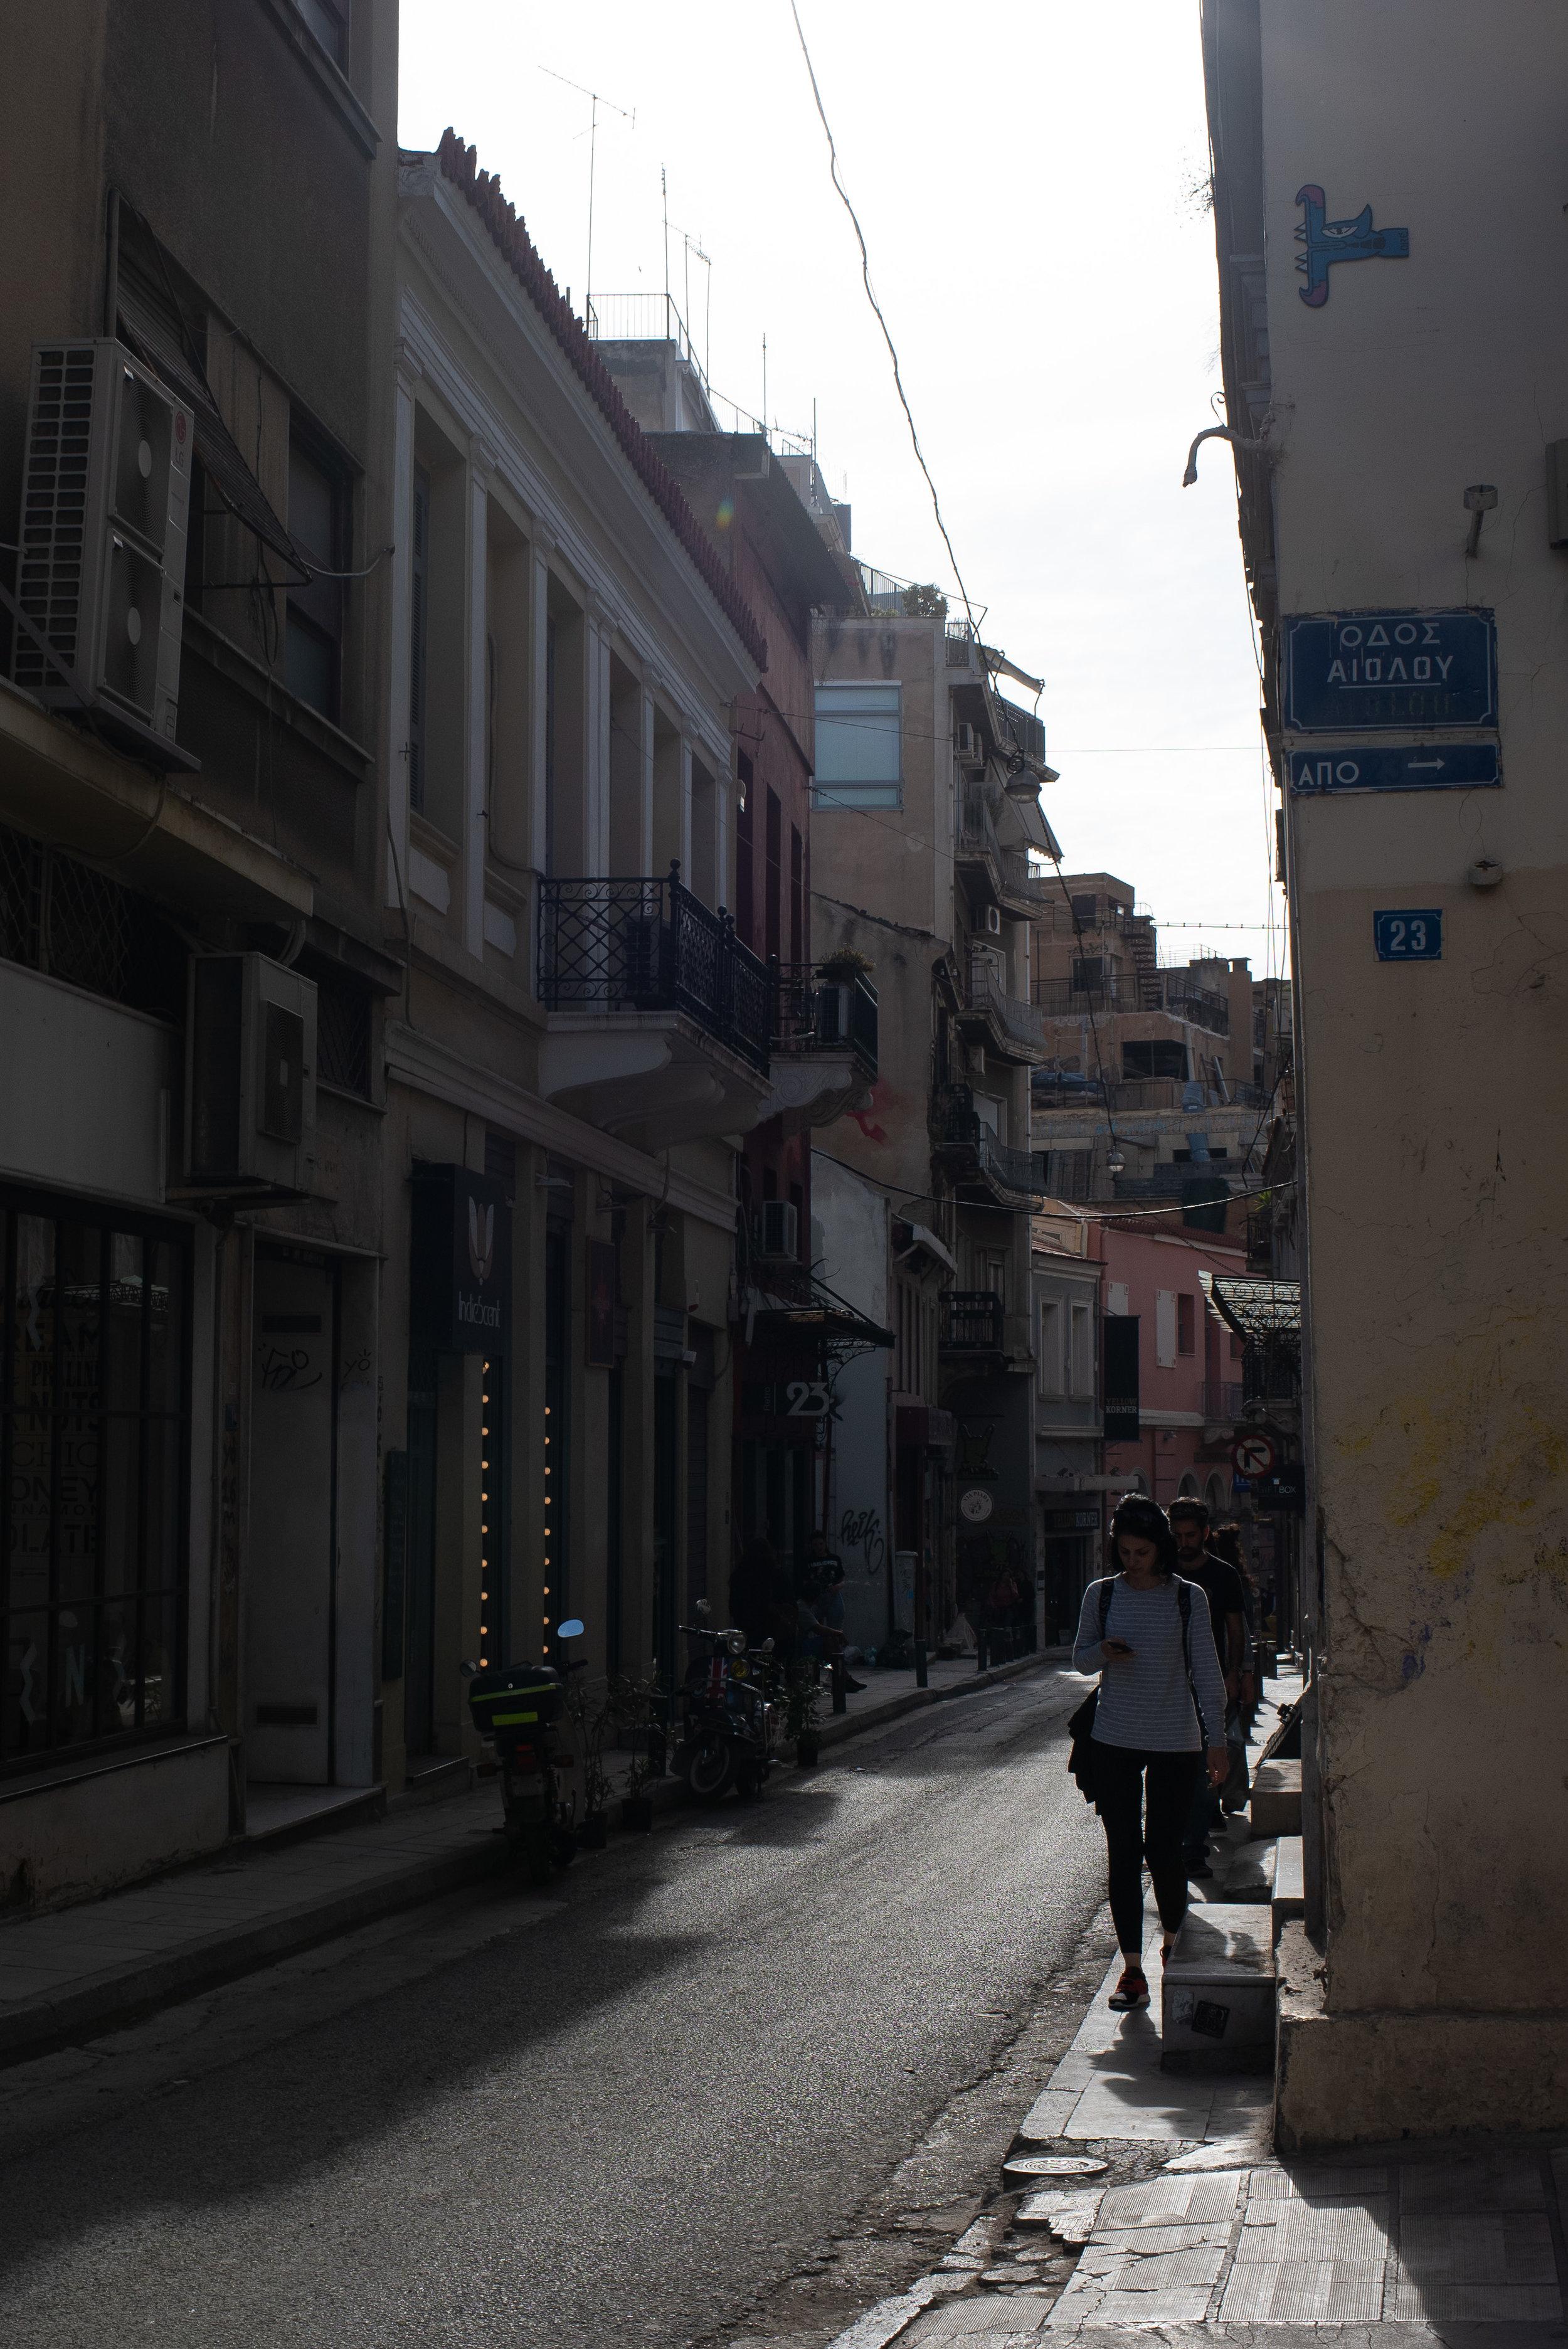 2019-May-14-Athens-Greece-137.jpg